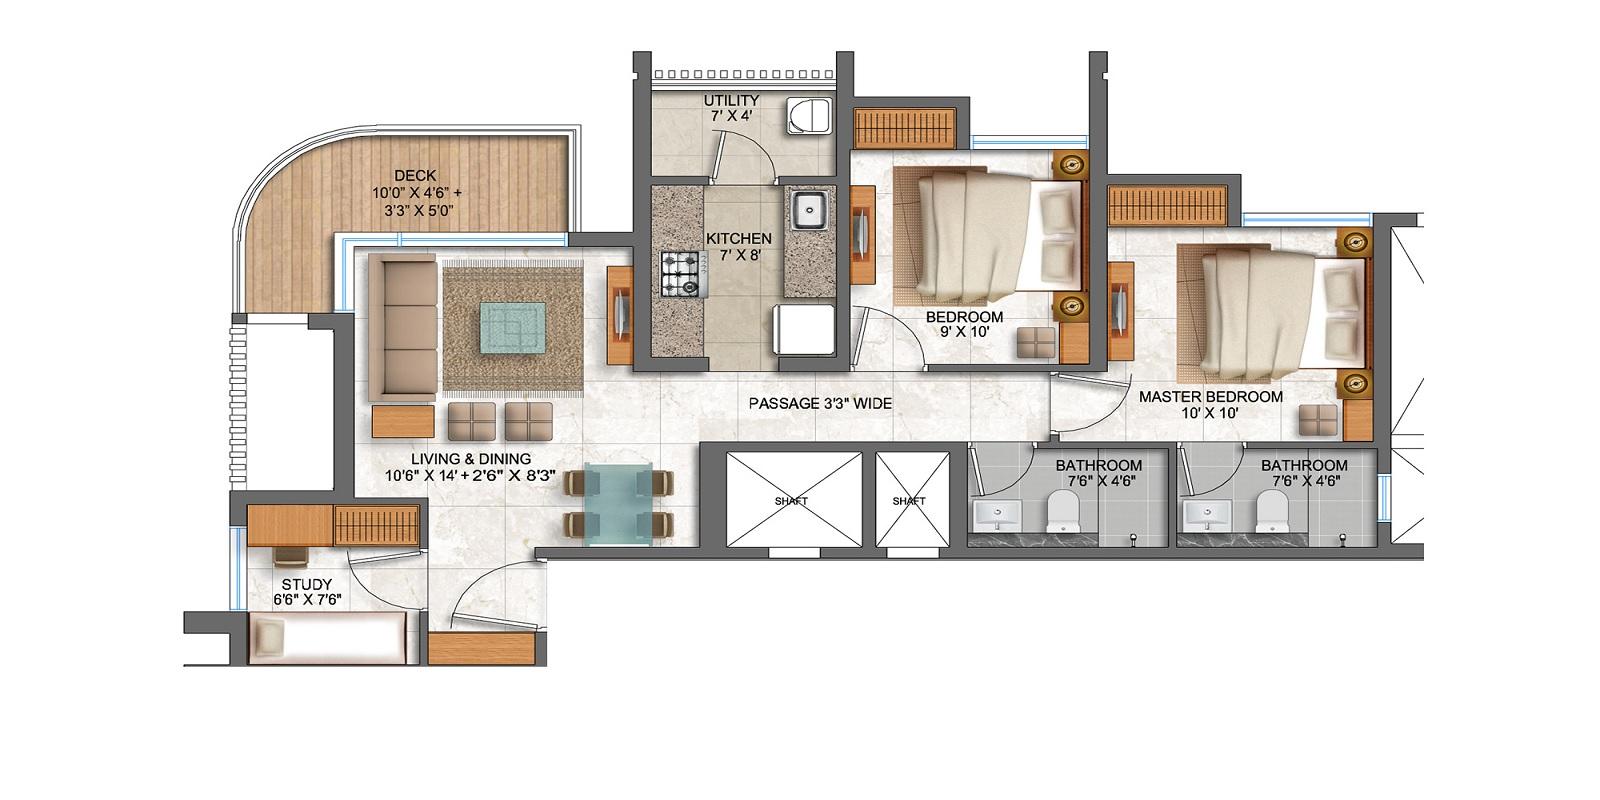 lodha prime square apartment 2bhk st 873sqft31